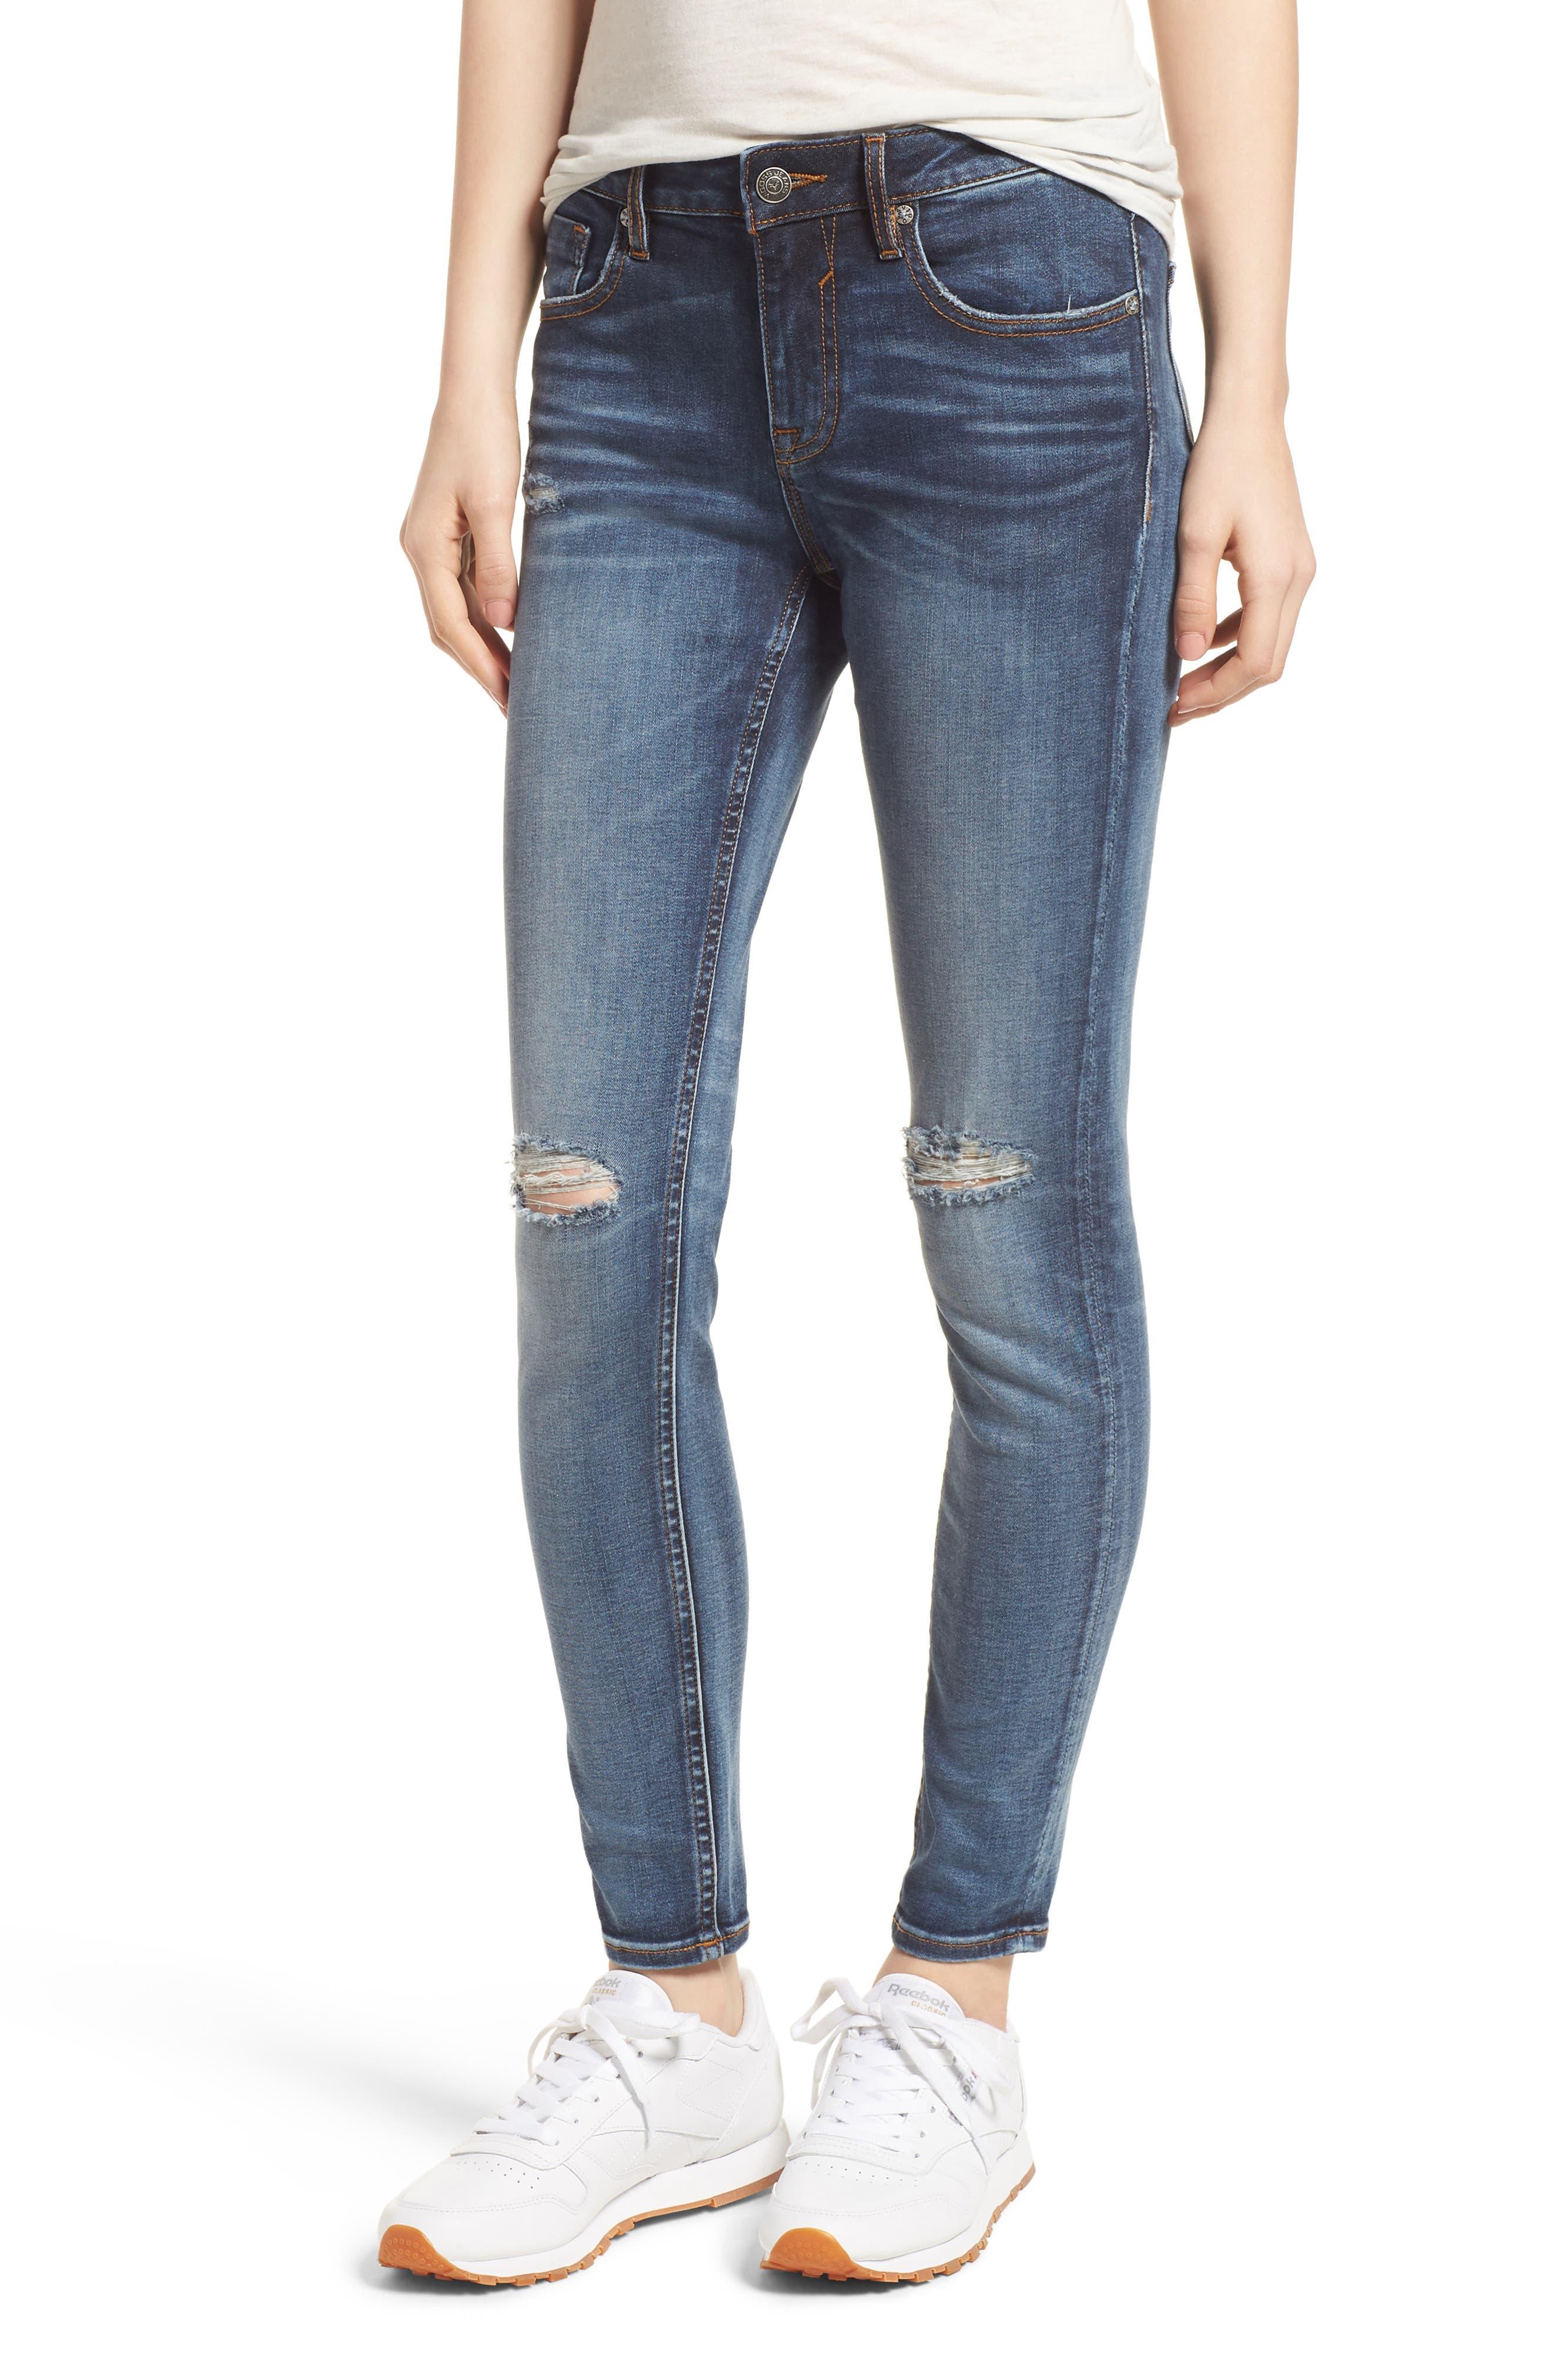 Alternate Image 1 Selected - Vigoss Jagger Ripped Skinny Jeans